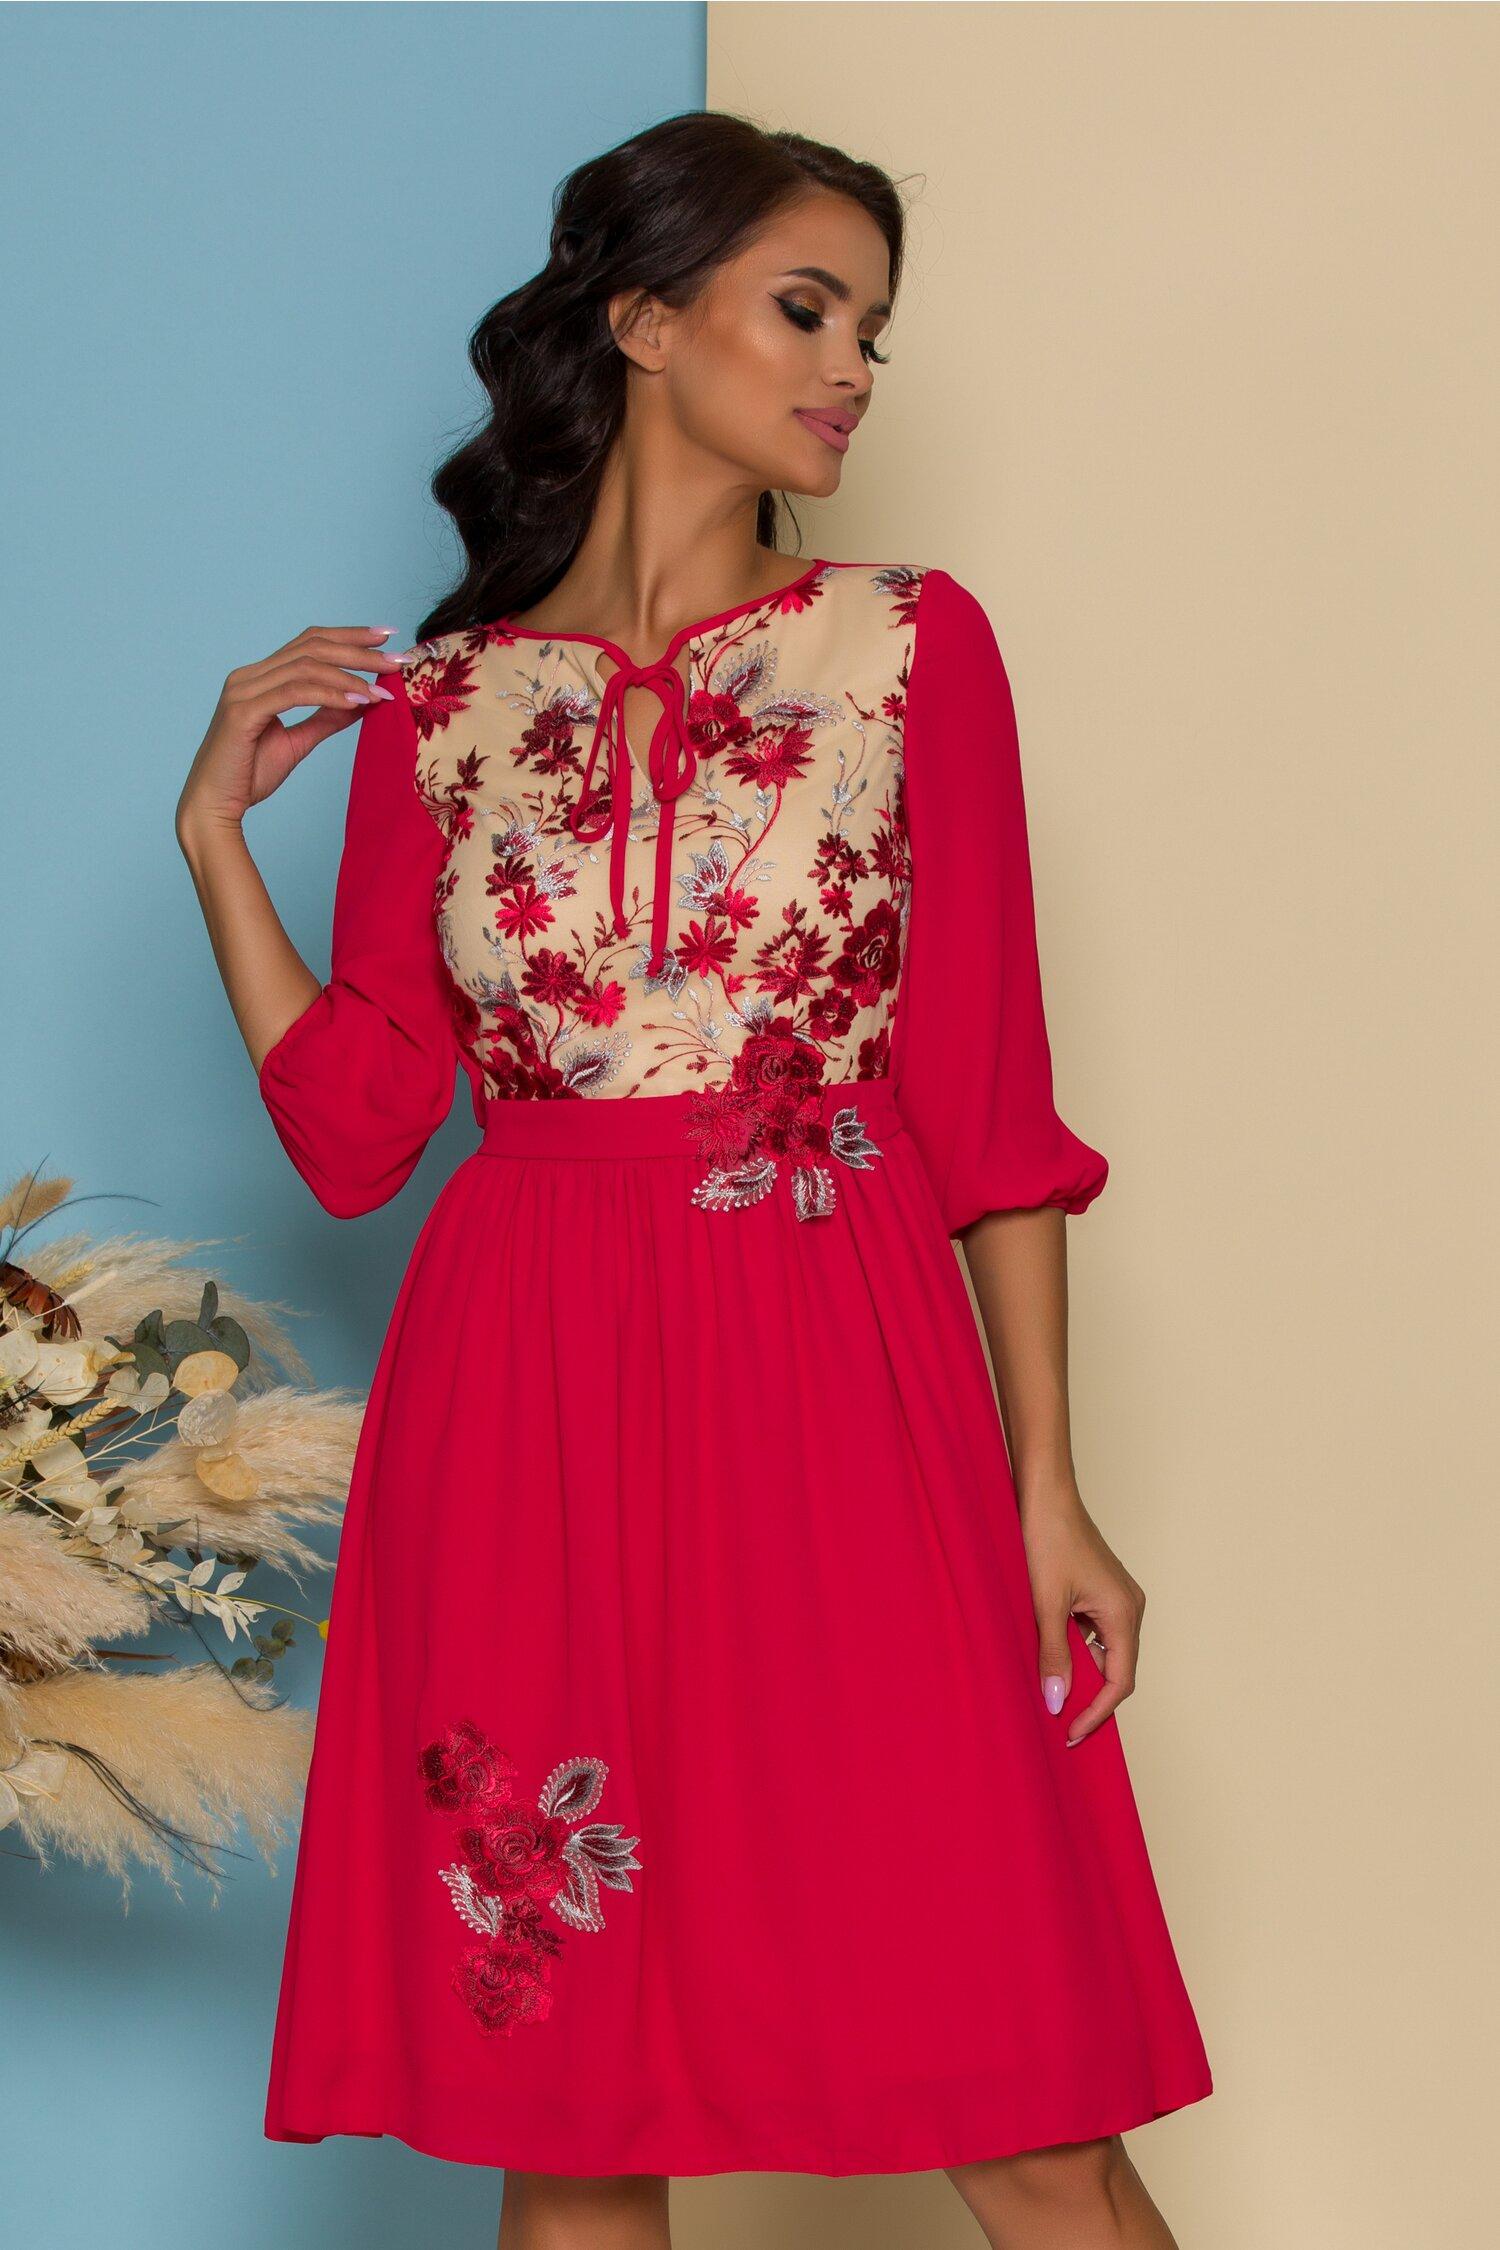 rochie ladonna rosie cu bej la bust si broderie florala 559140 4